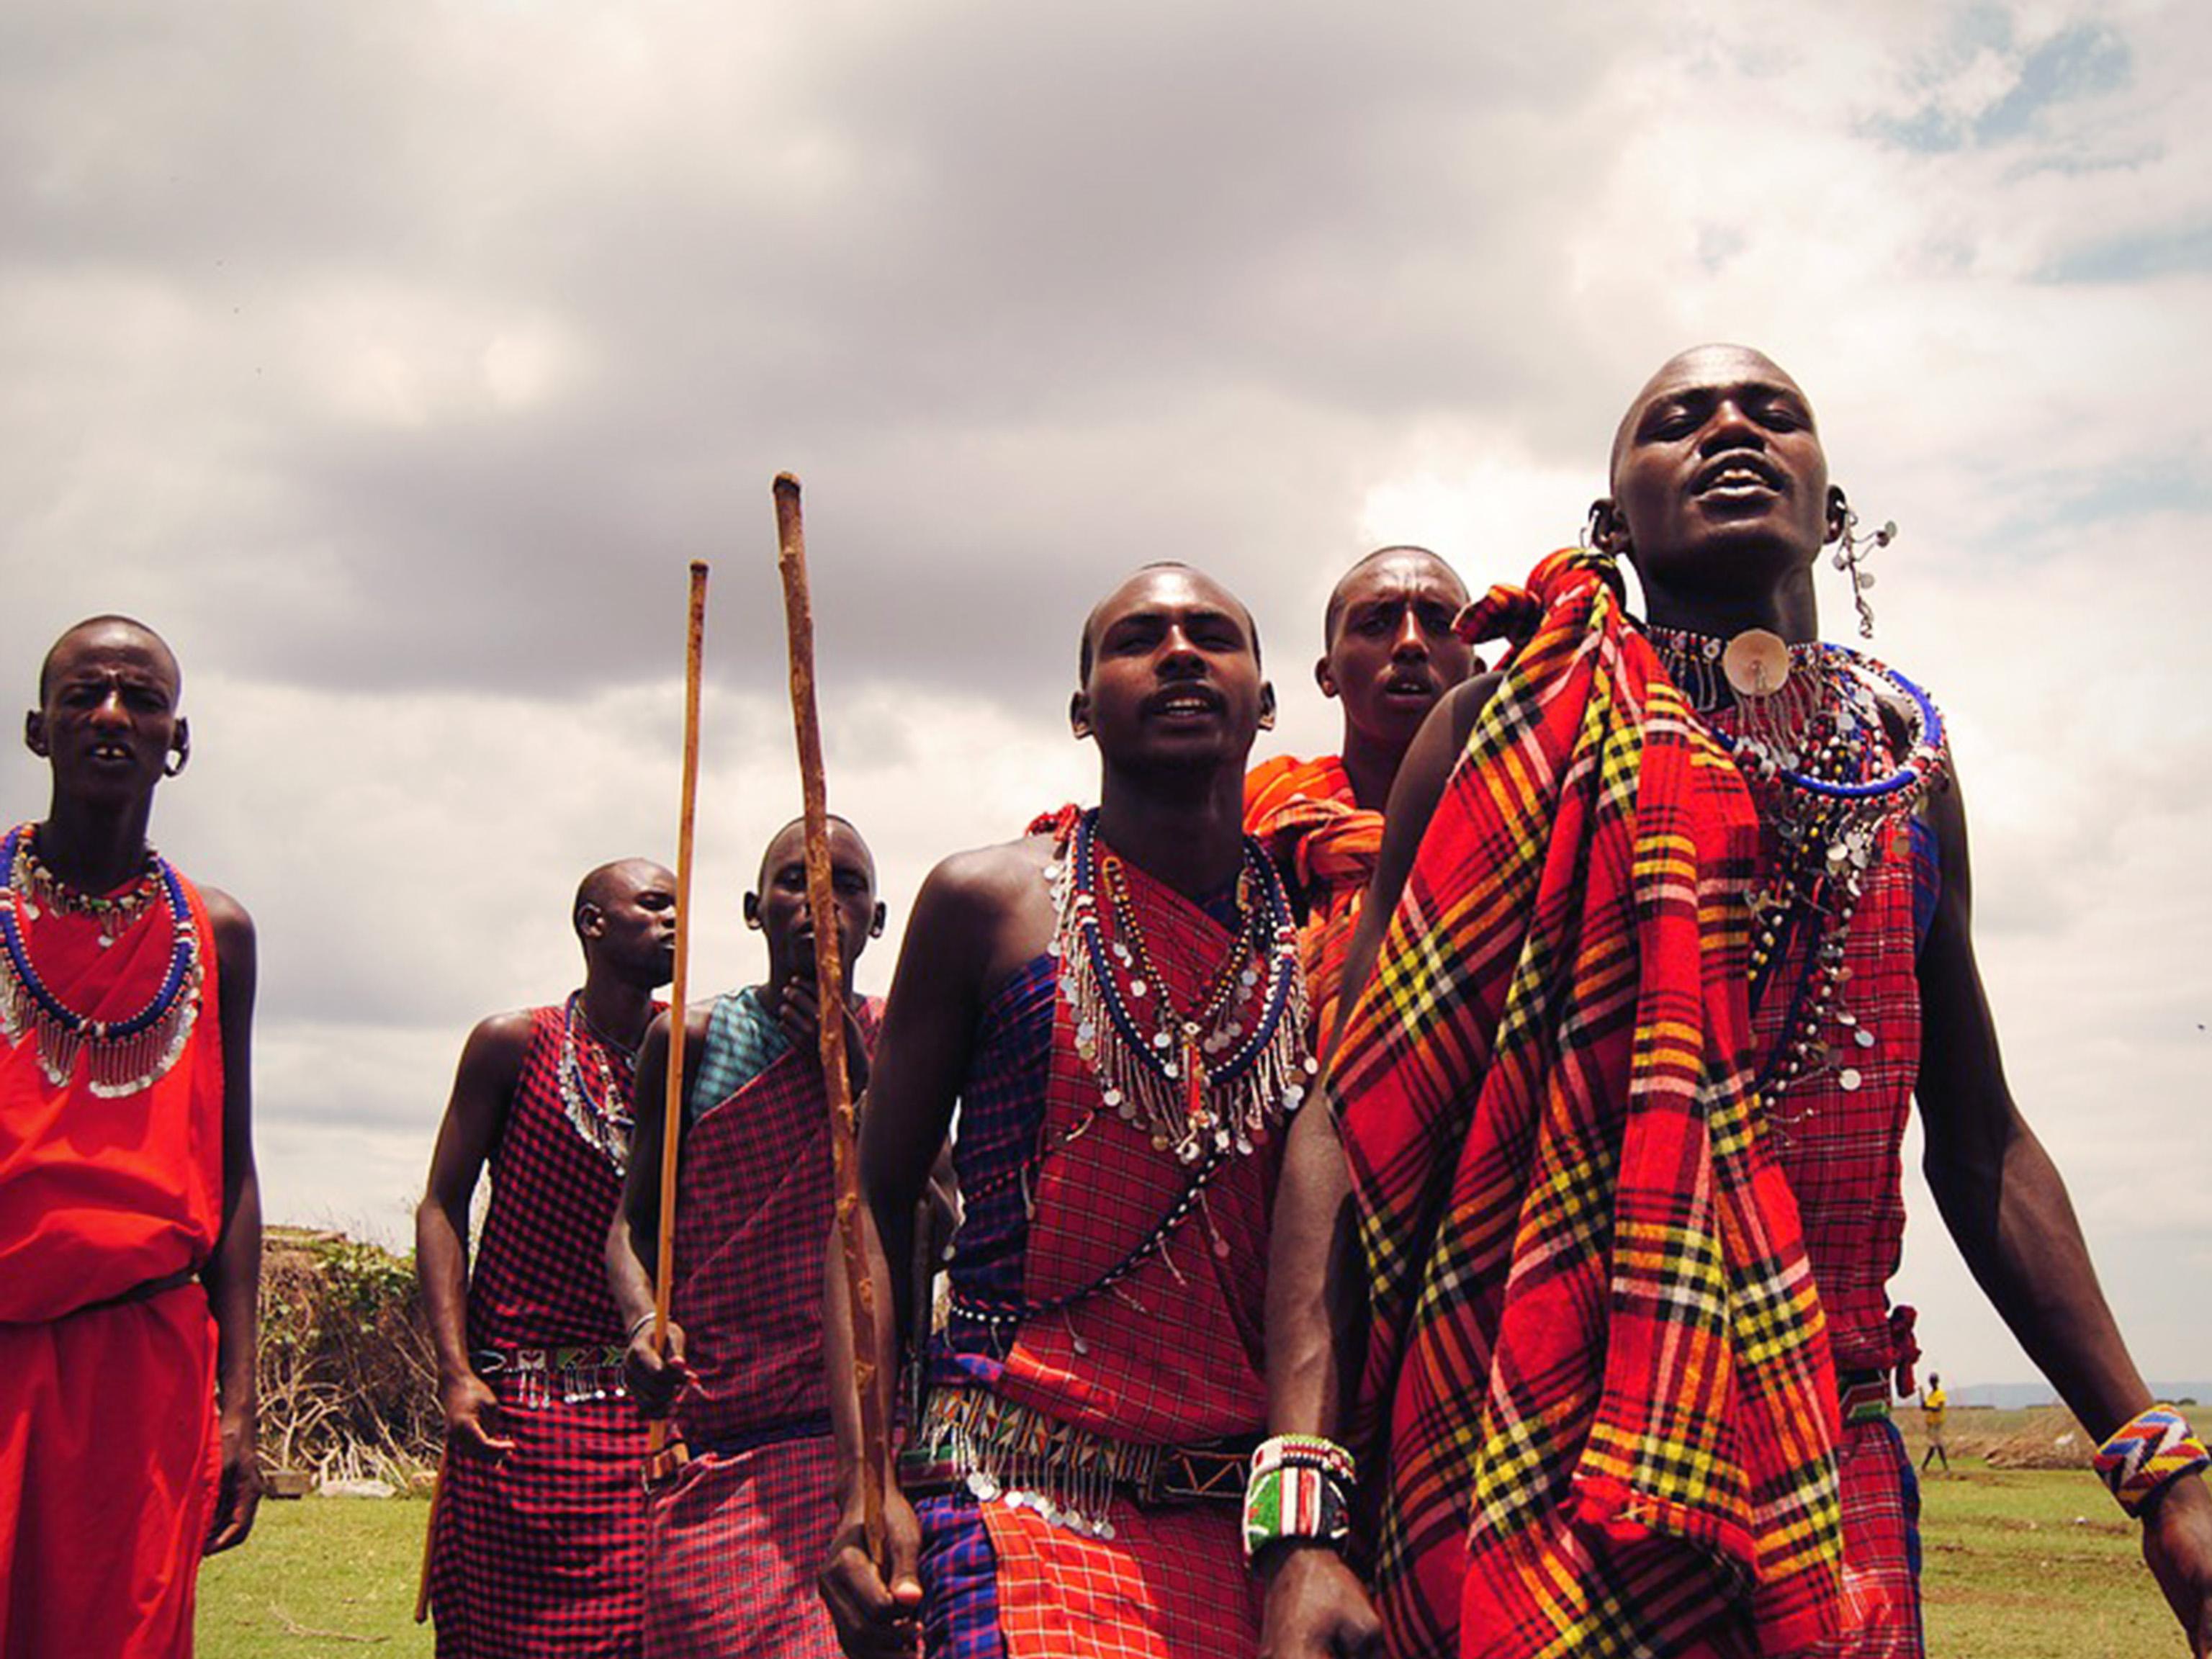 Masai Mara Tribe Kenya